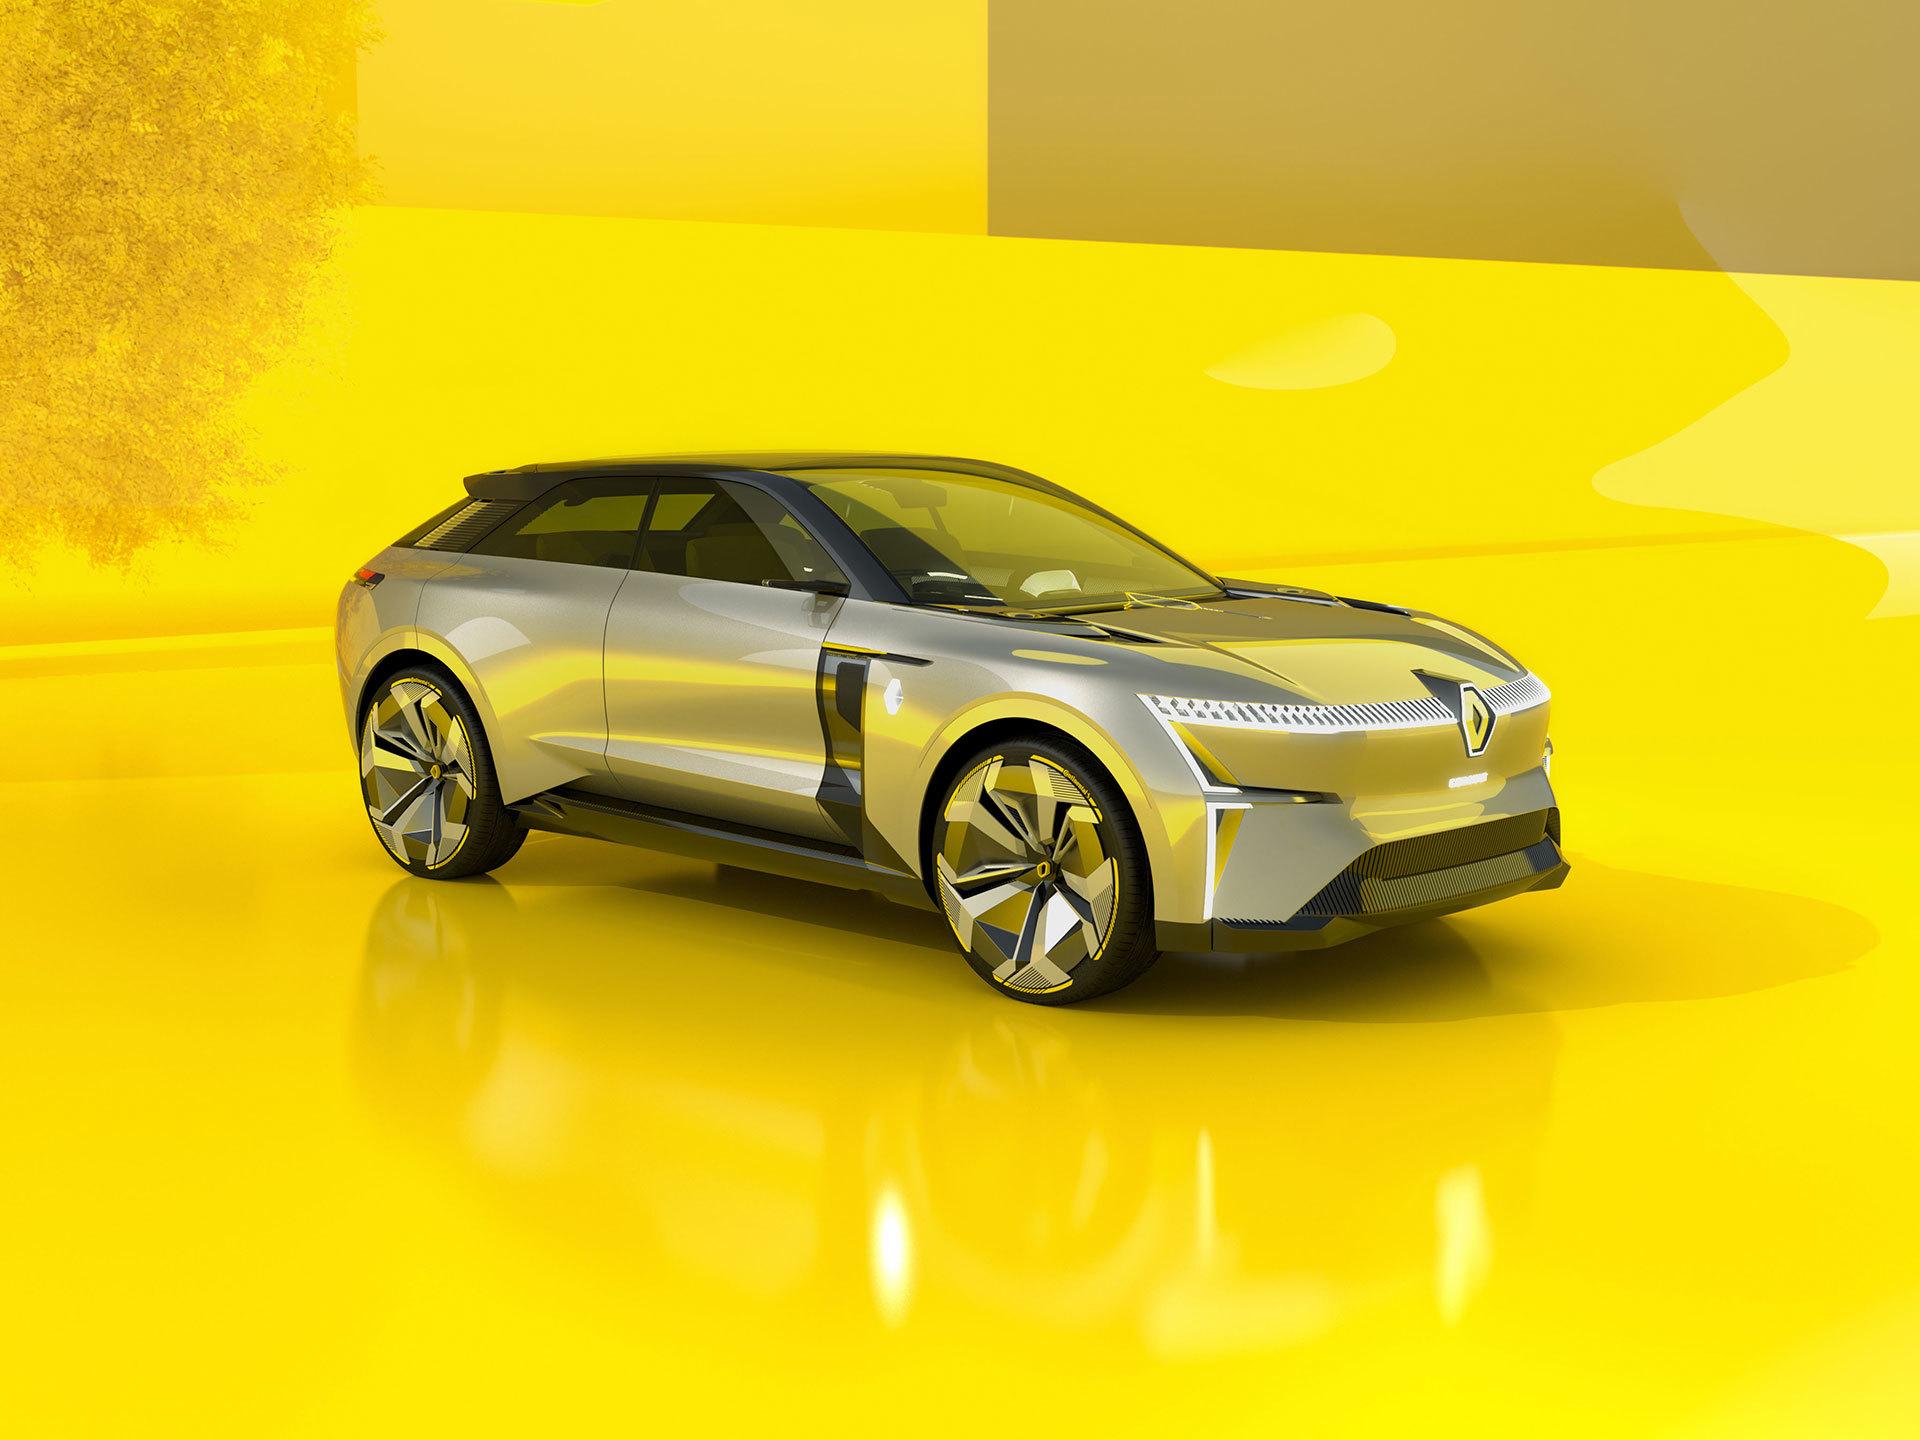 Renault Morphoz 2020 126